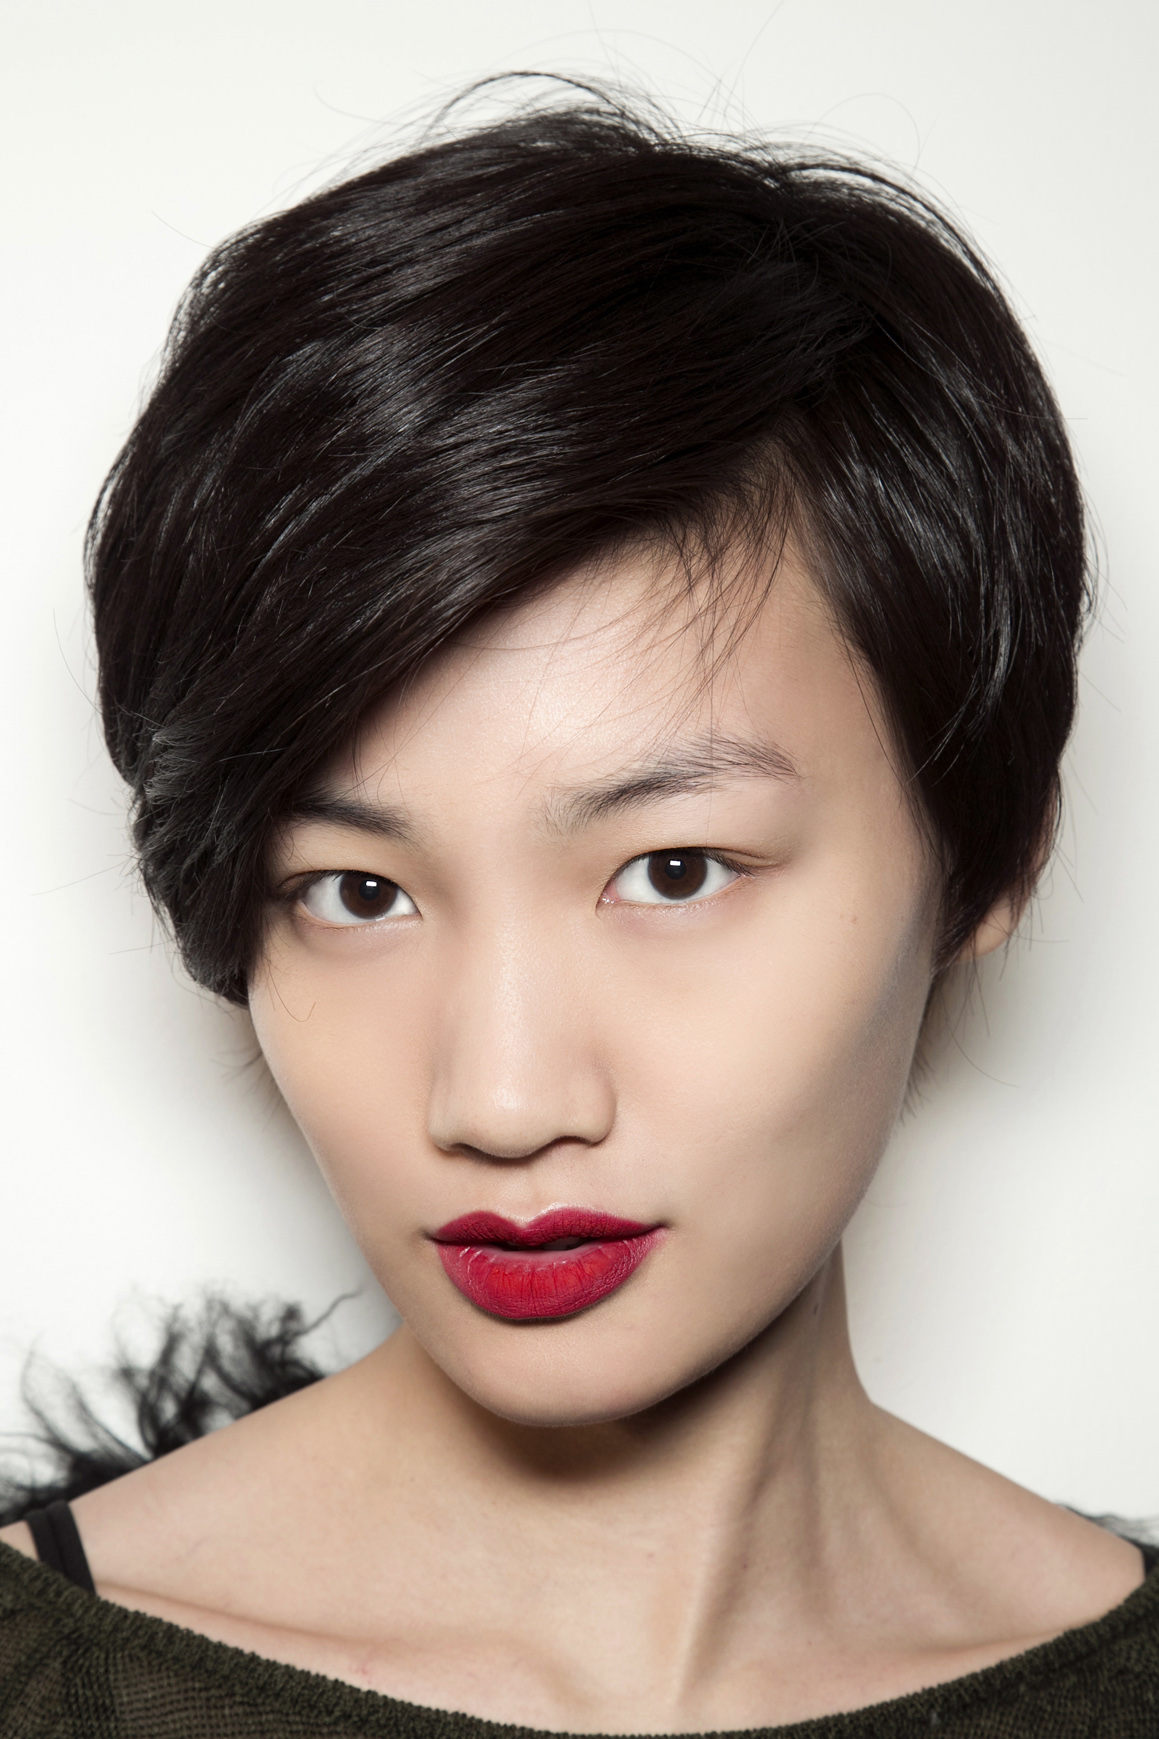 Cheveux courts : 10 tendances à absolument adopter